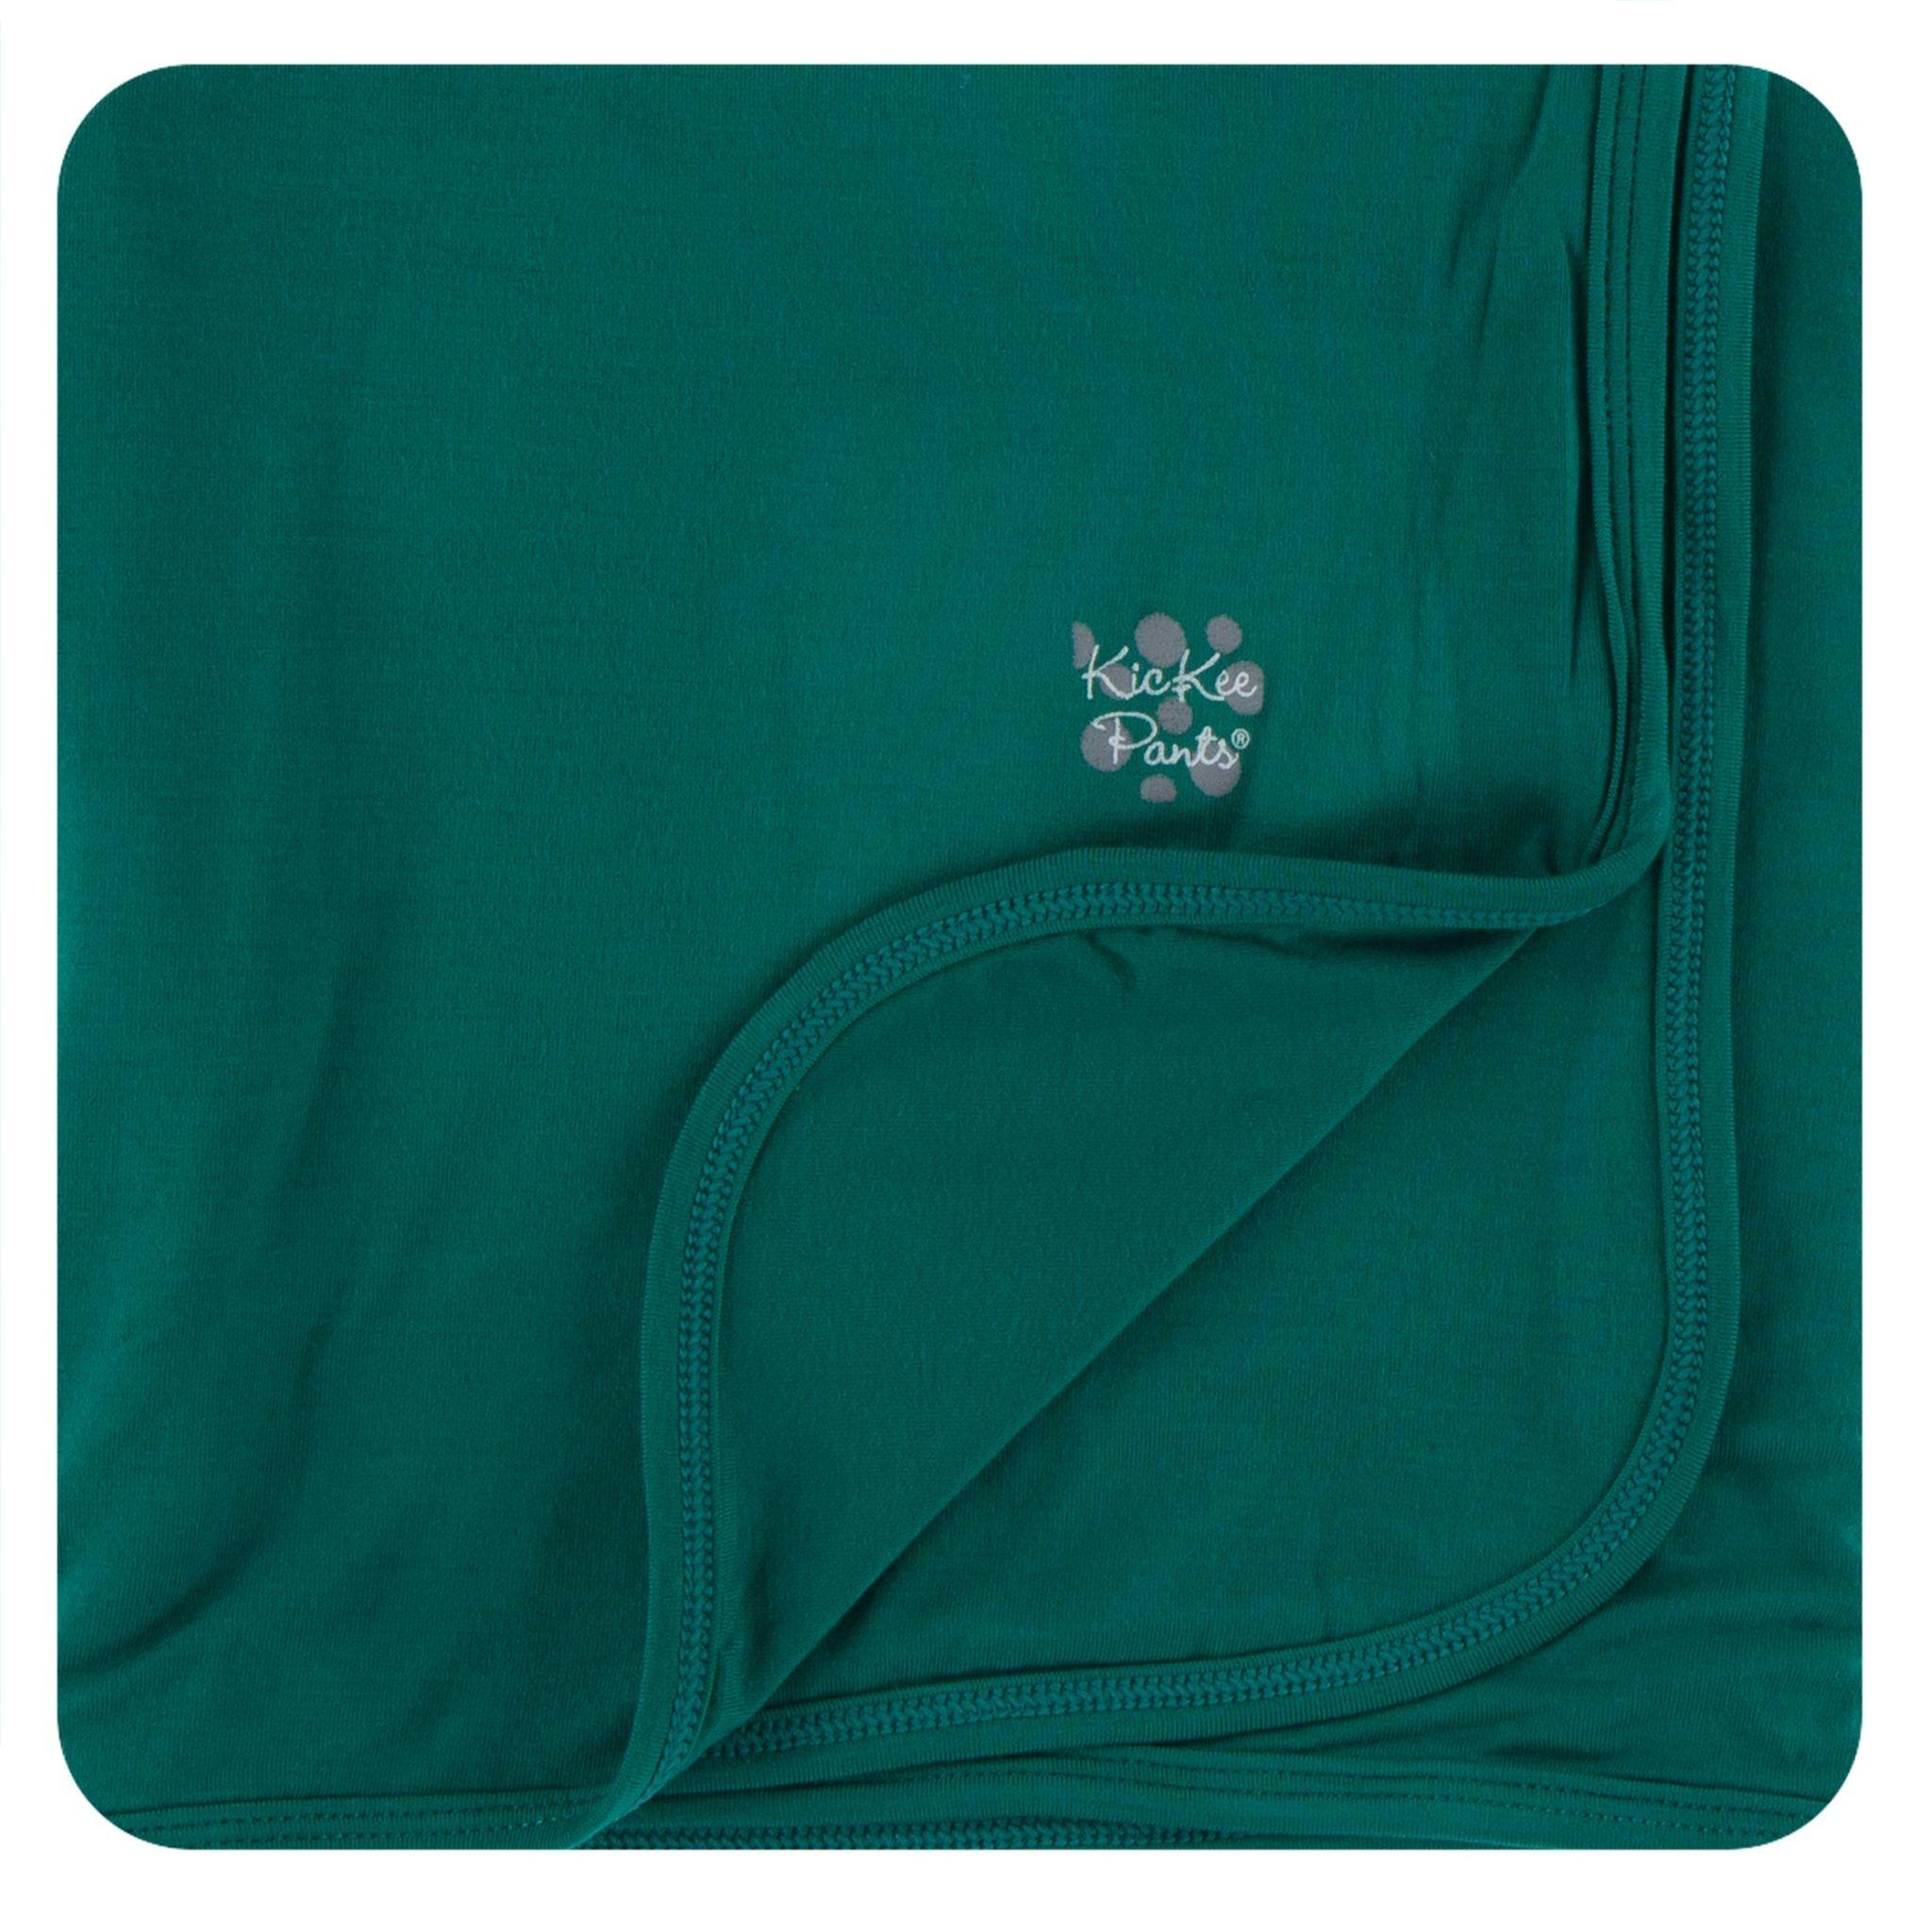 Kickee Pants Solid Stroller Blanket Pine - One Size